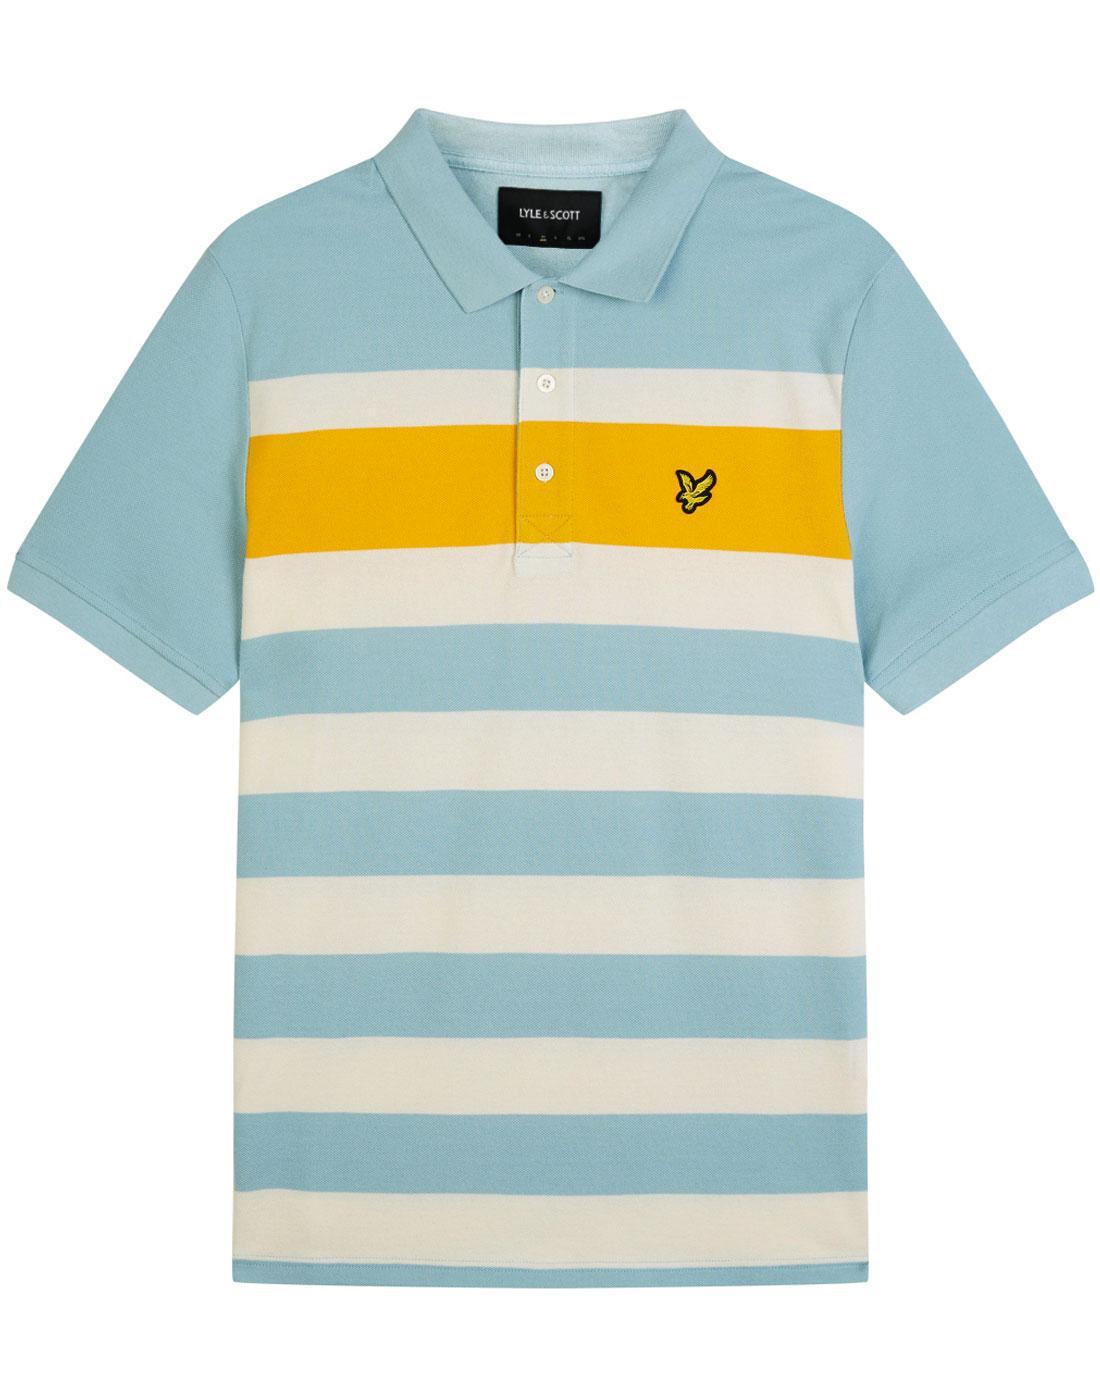 LYLE & SCOTT Mod Textured Stripe Panel Polo Shirt